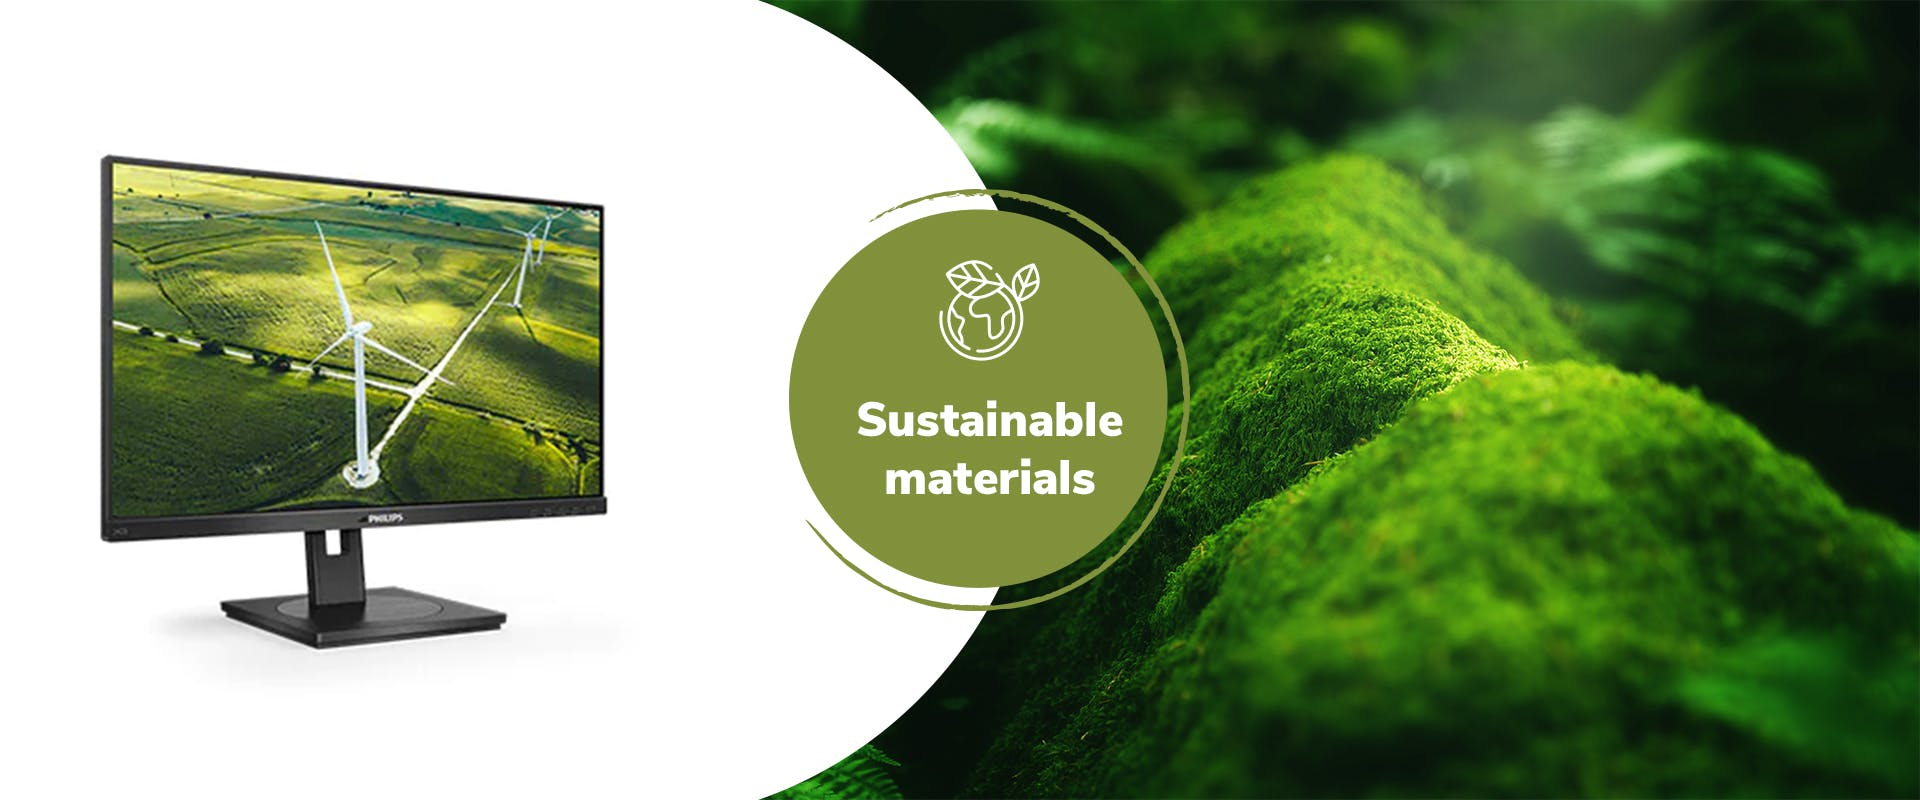 Philips Sustainable Displays